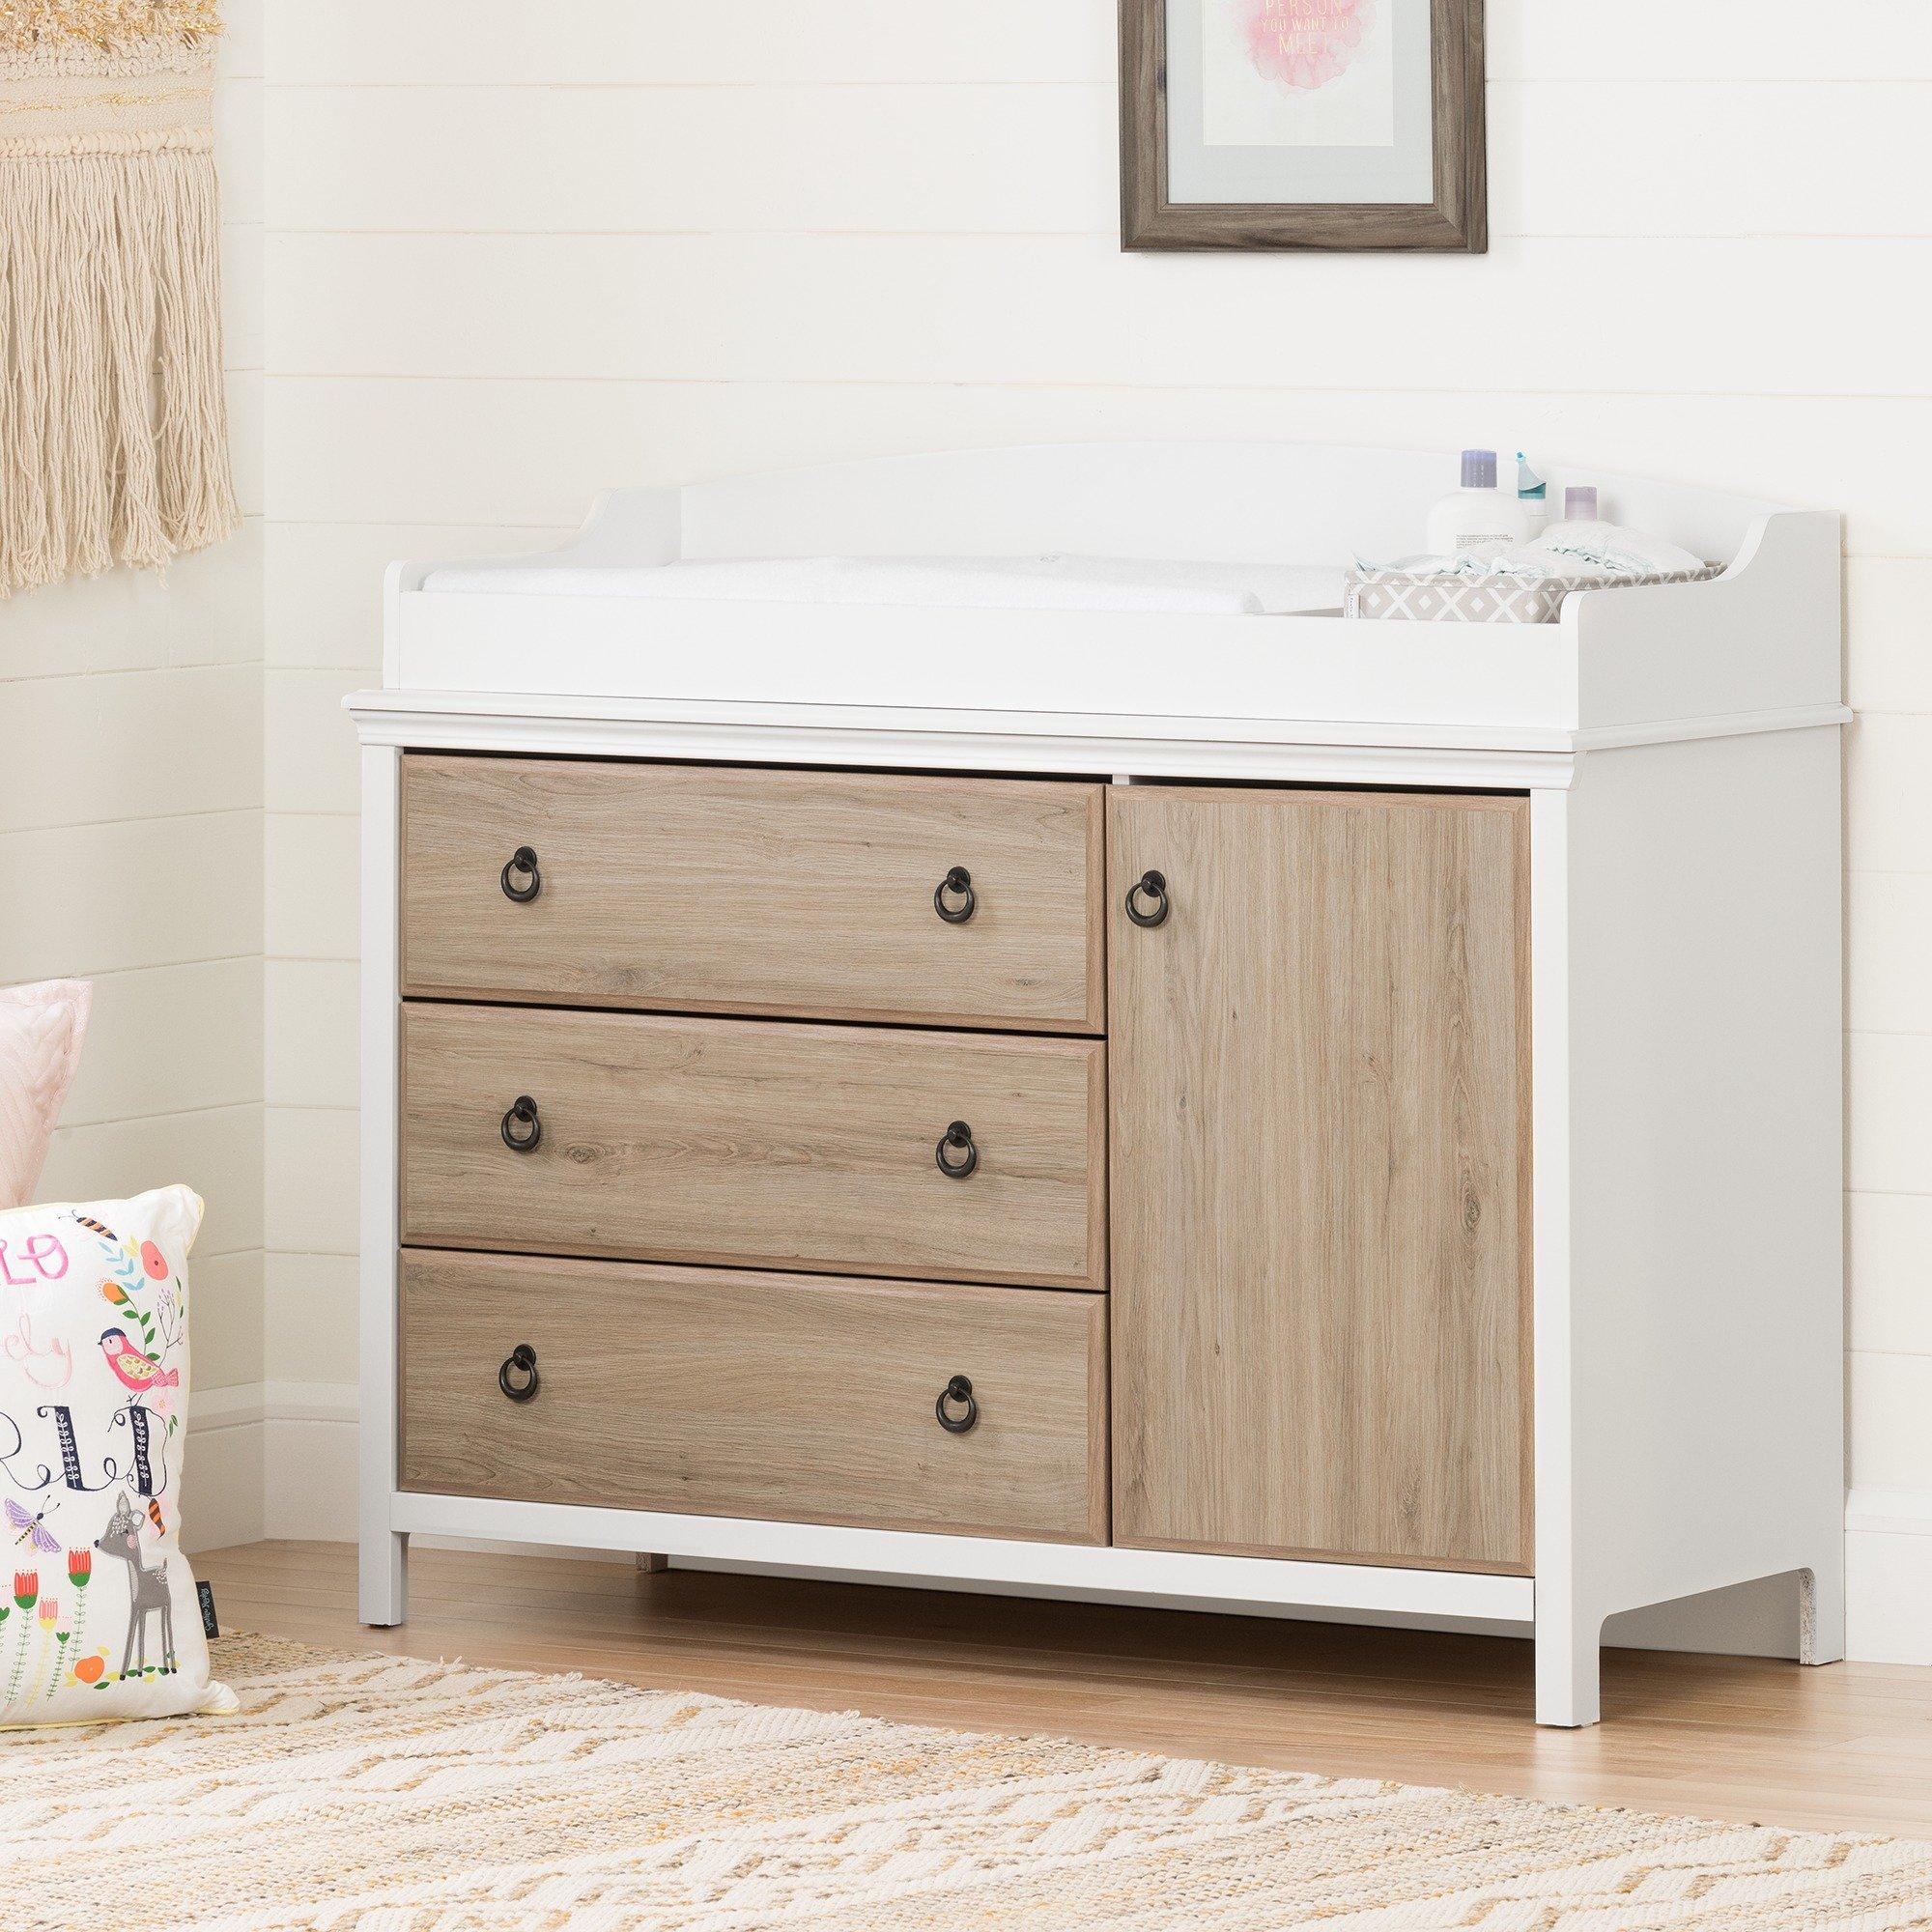 South Shore Catimini Dresser Changer in White and Rustic Oak